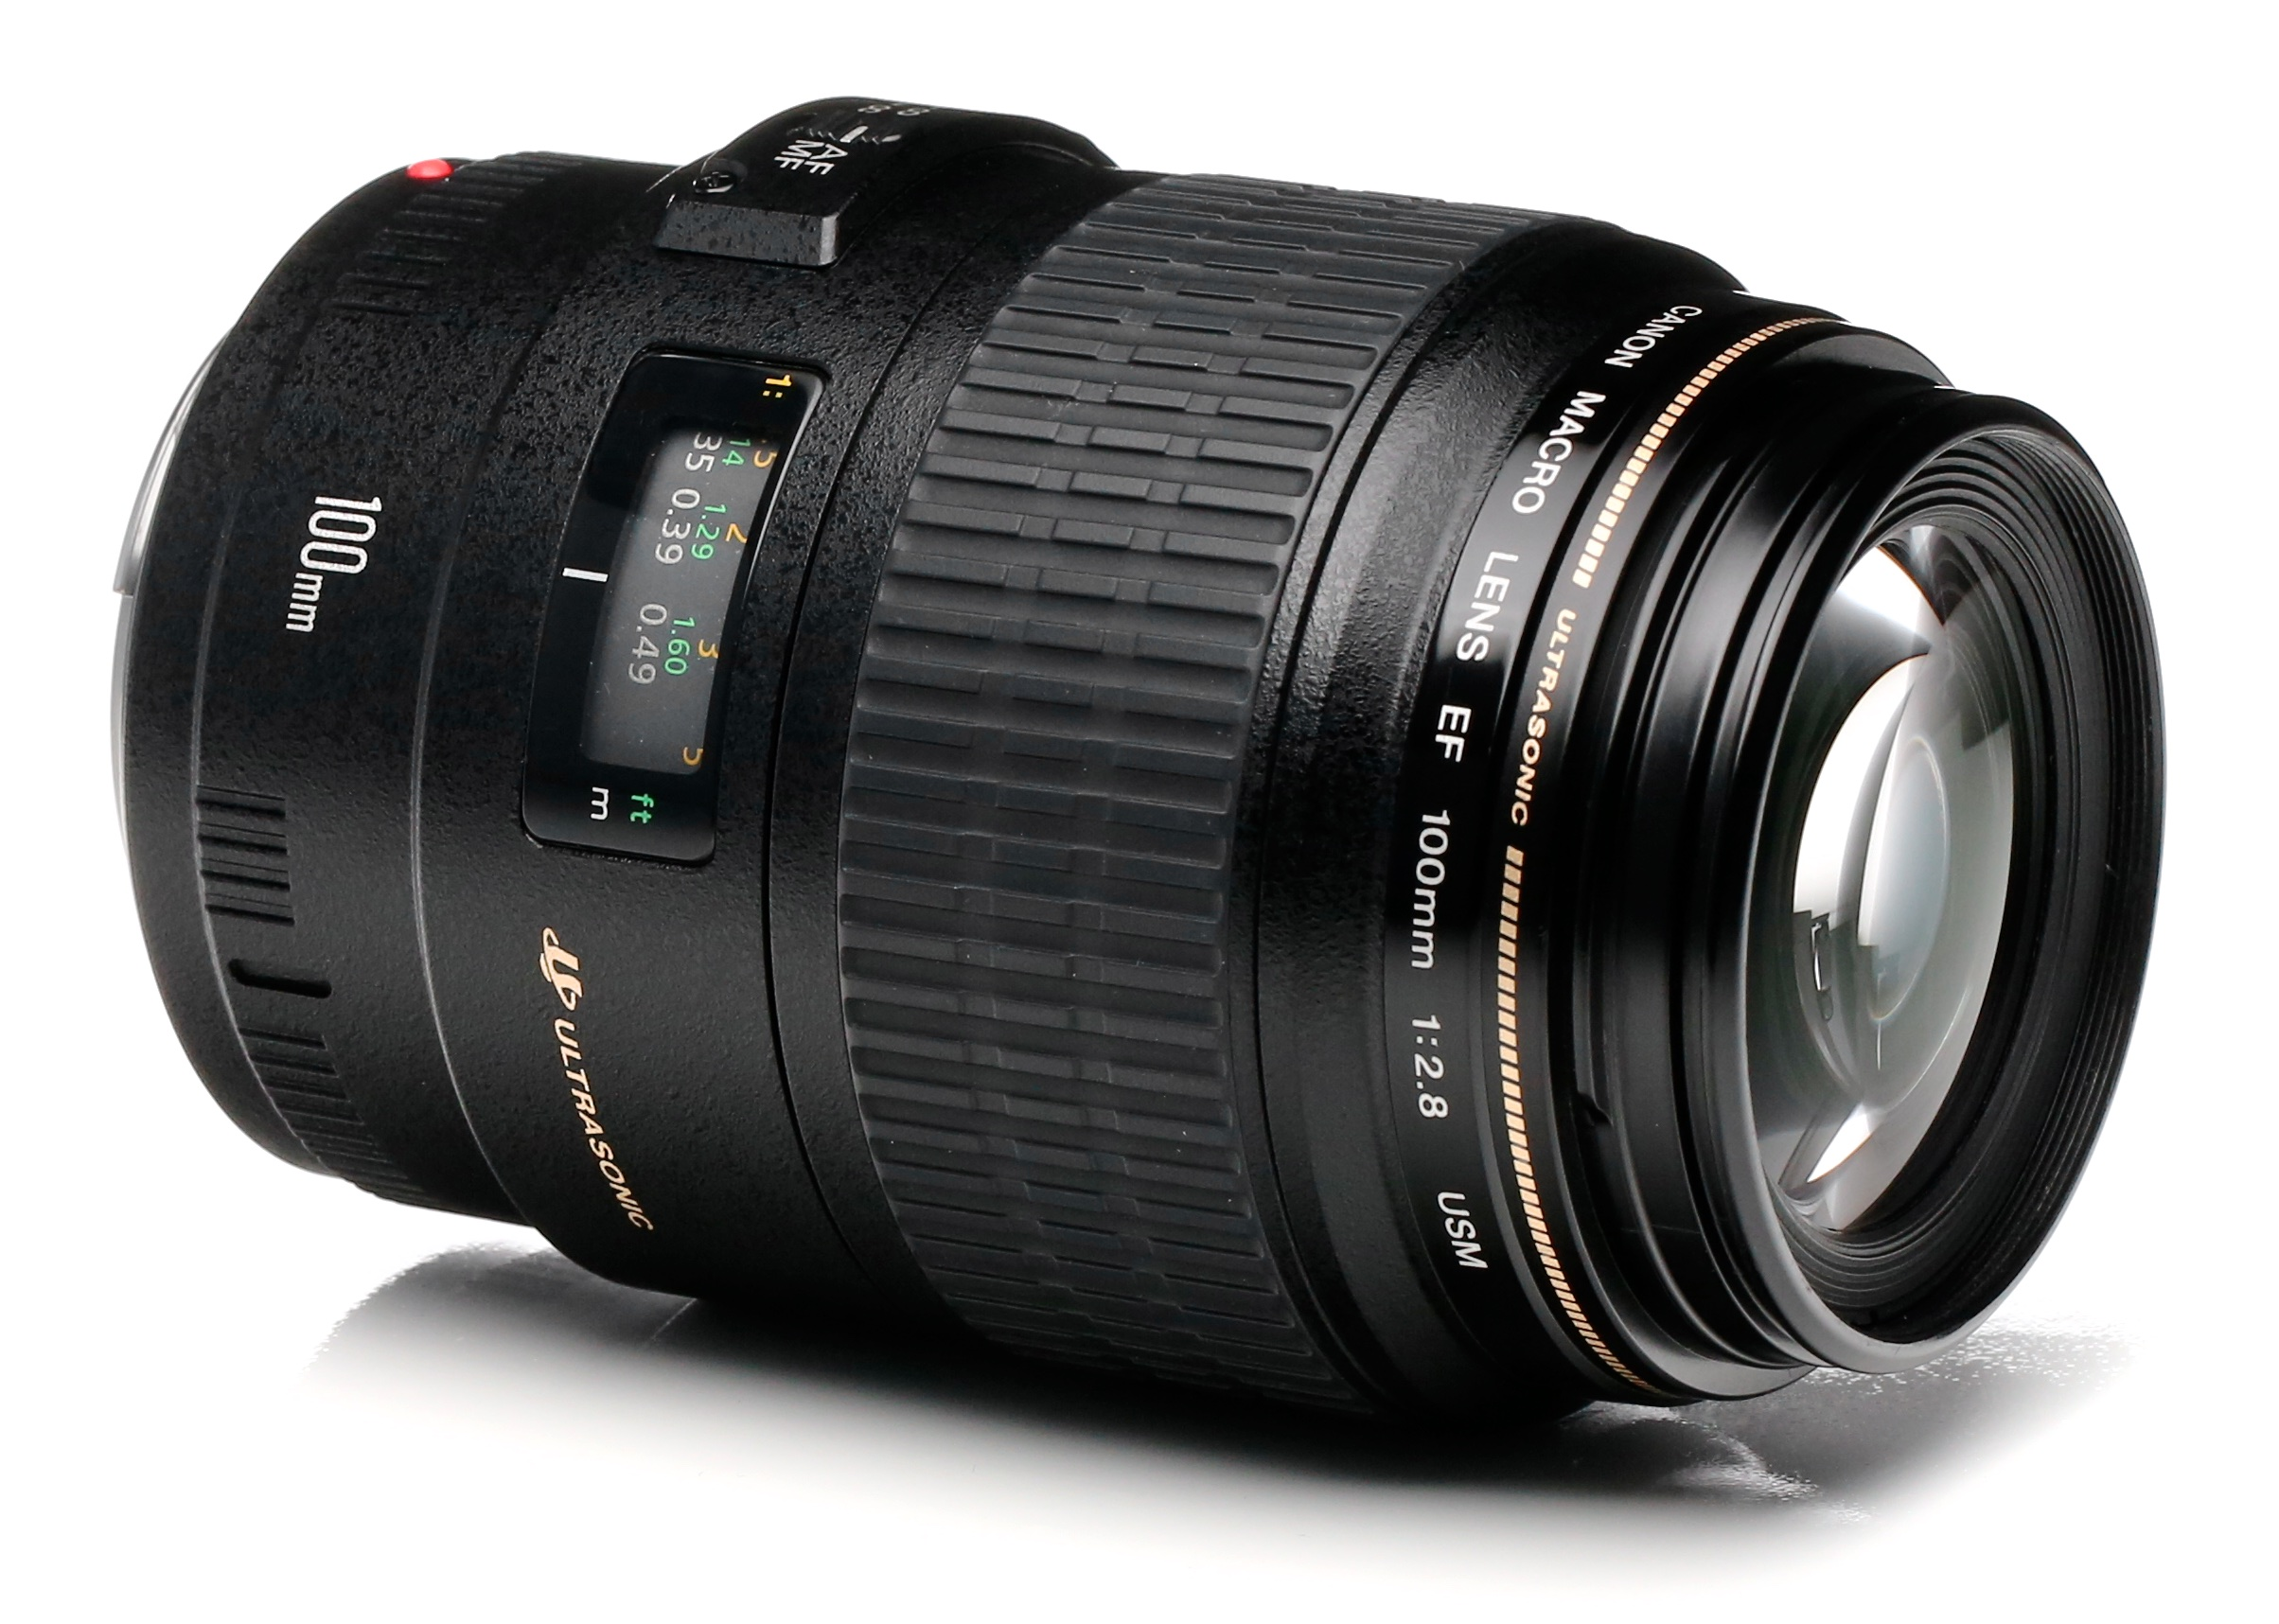 Canon EF 100mm F/2.8 L IS USM Macro kaufen auf Ricardo